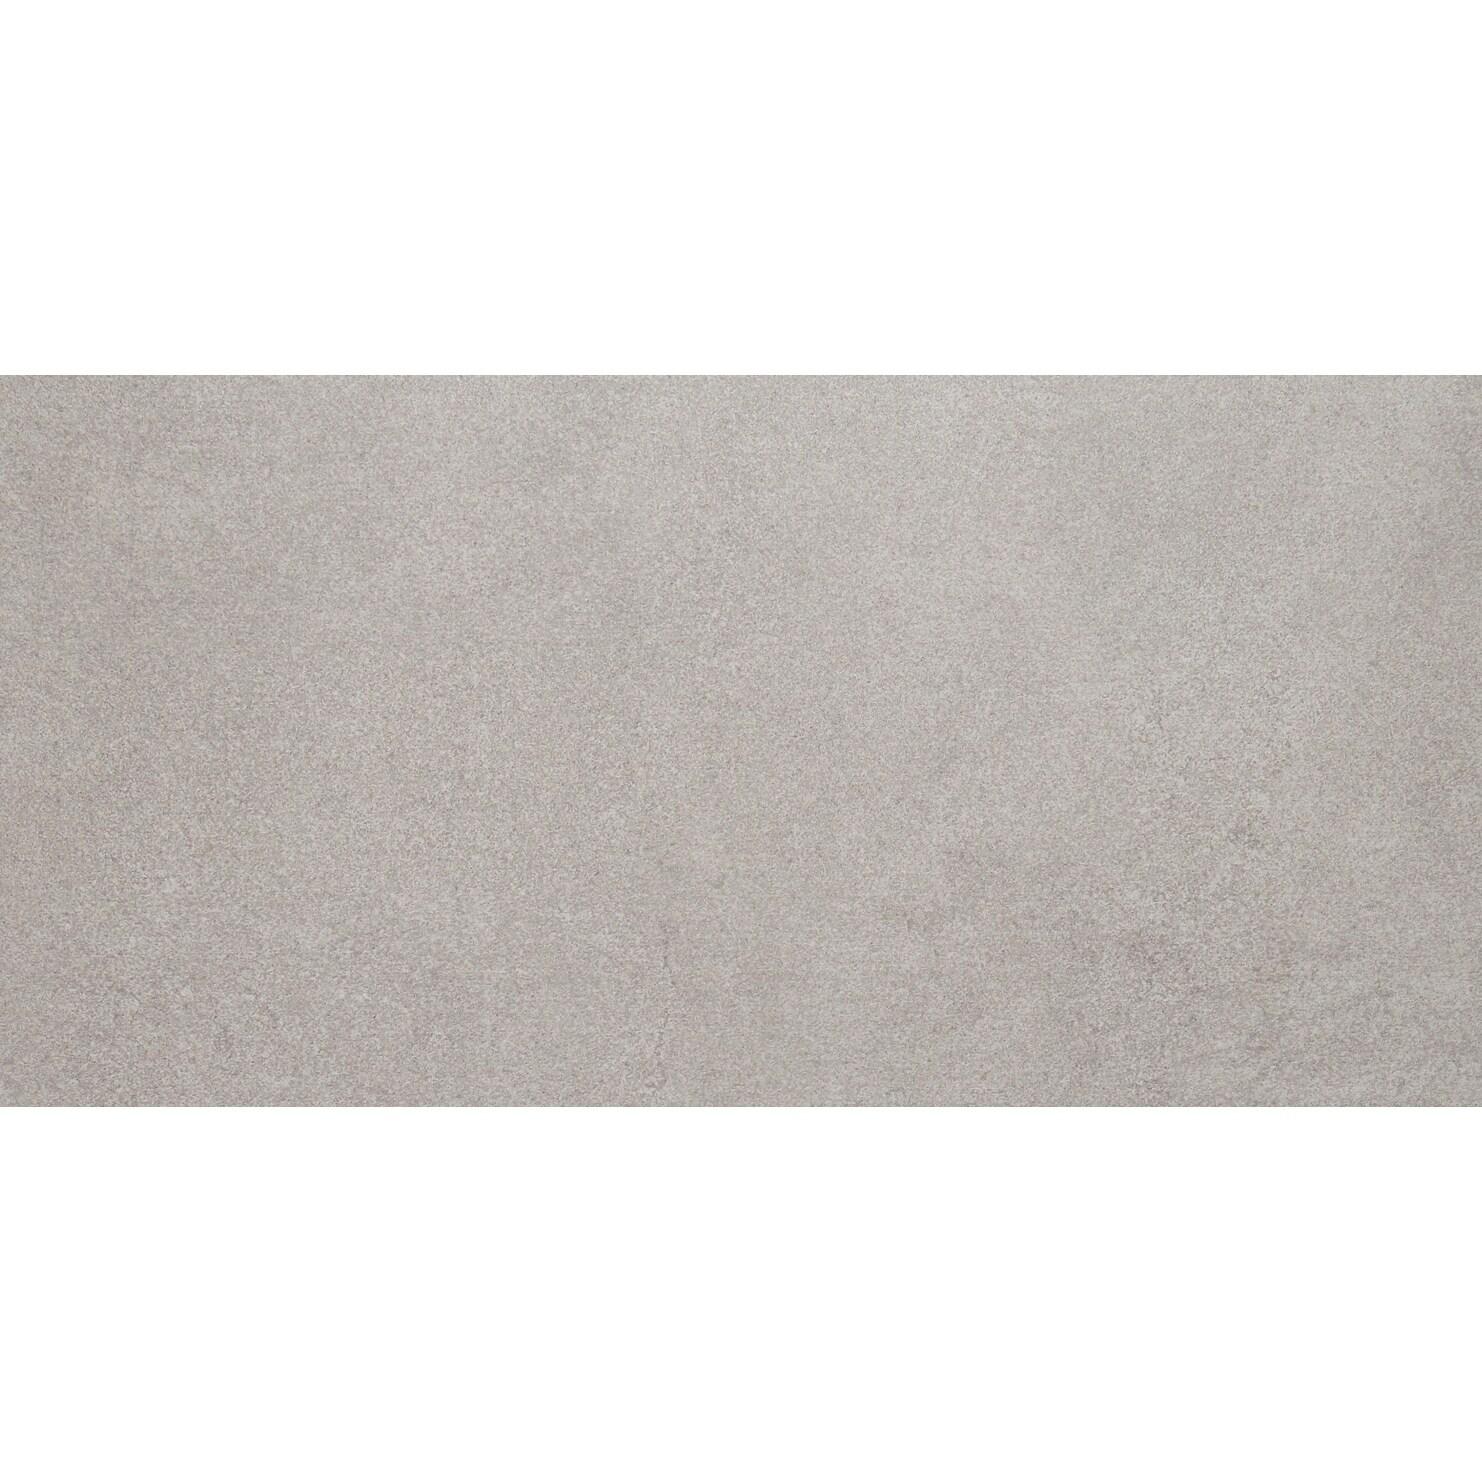 Shop Contemporary Cement Visual 12x24 Inch Ceramic Floor Tile In